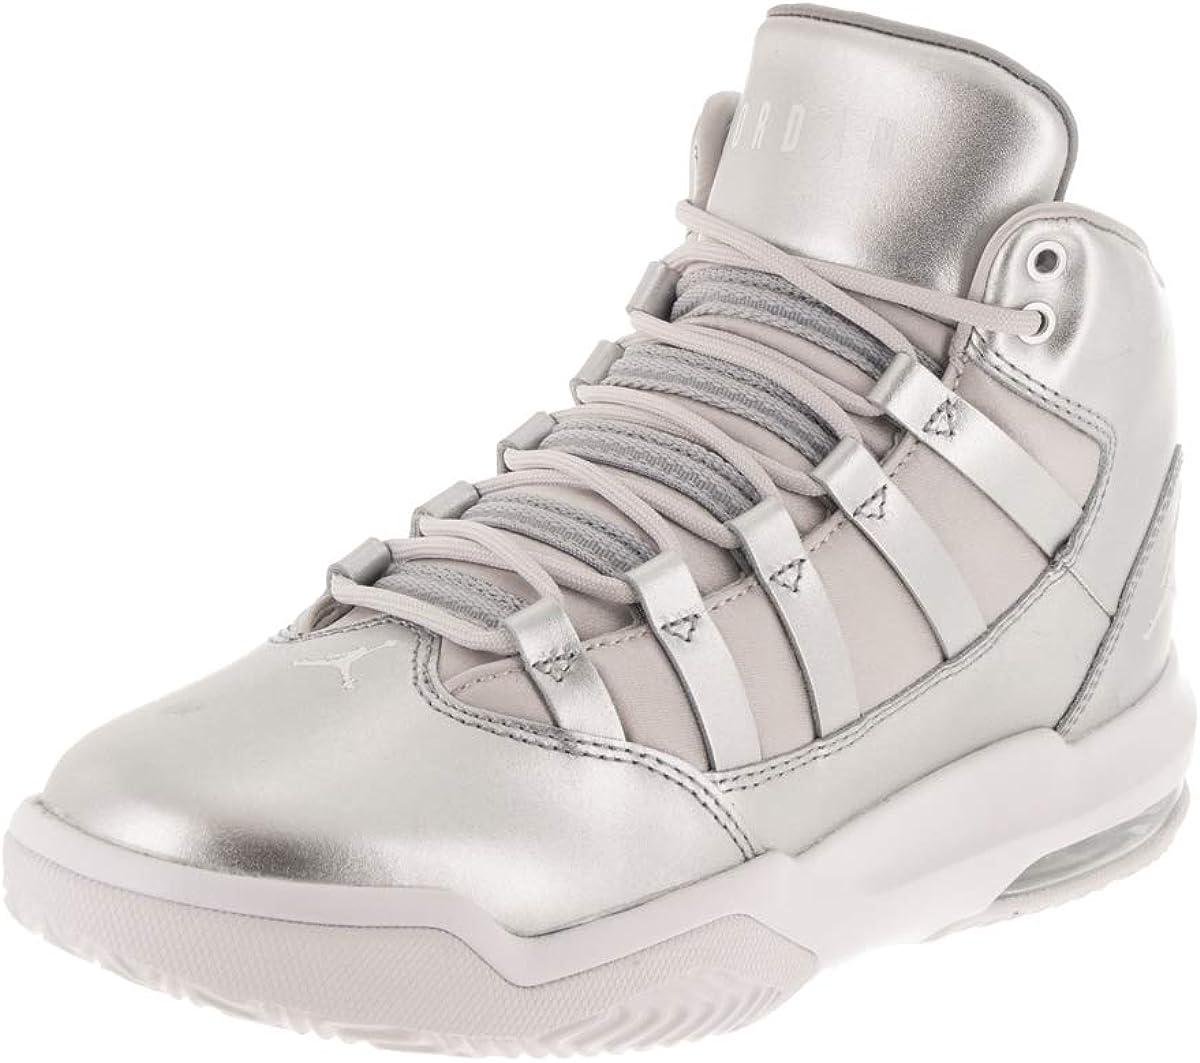 Jordan Max Aura Se (Gs) Fitness Shoes